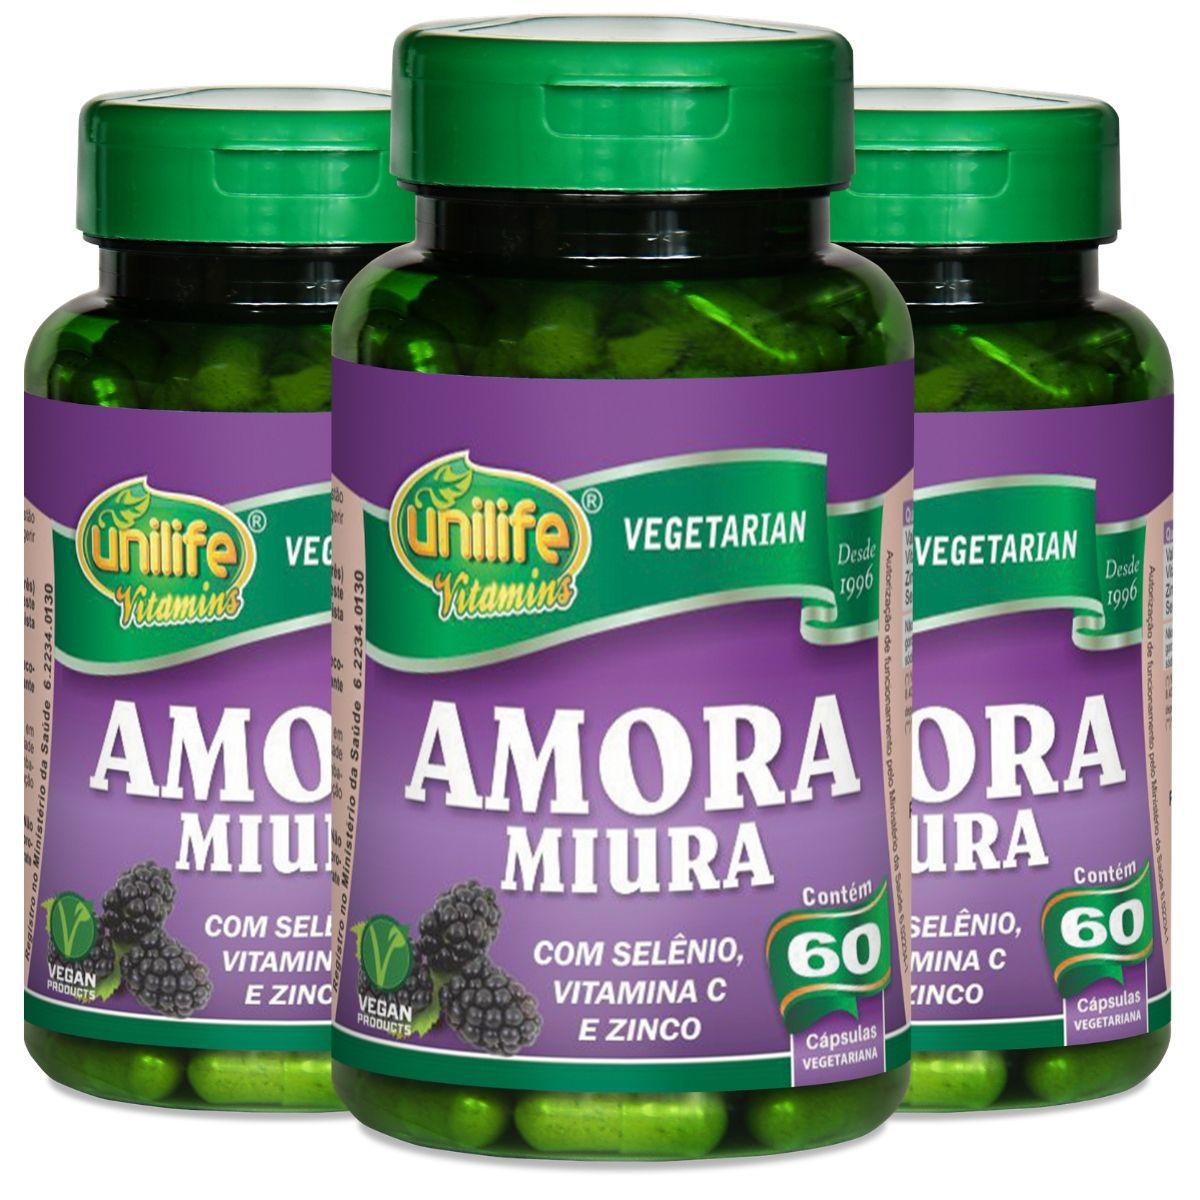 Kit 3 Amora Miura Vitaminas e Mineral - 500mg 60 Capsulas - Unilife